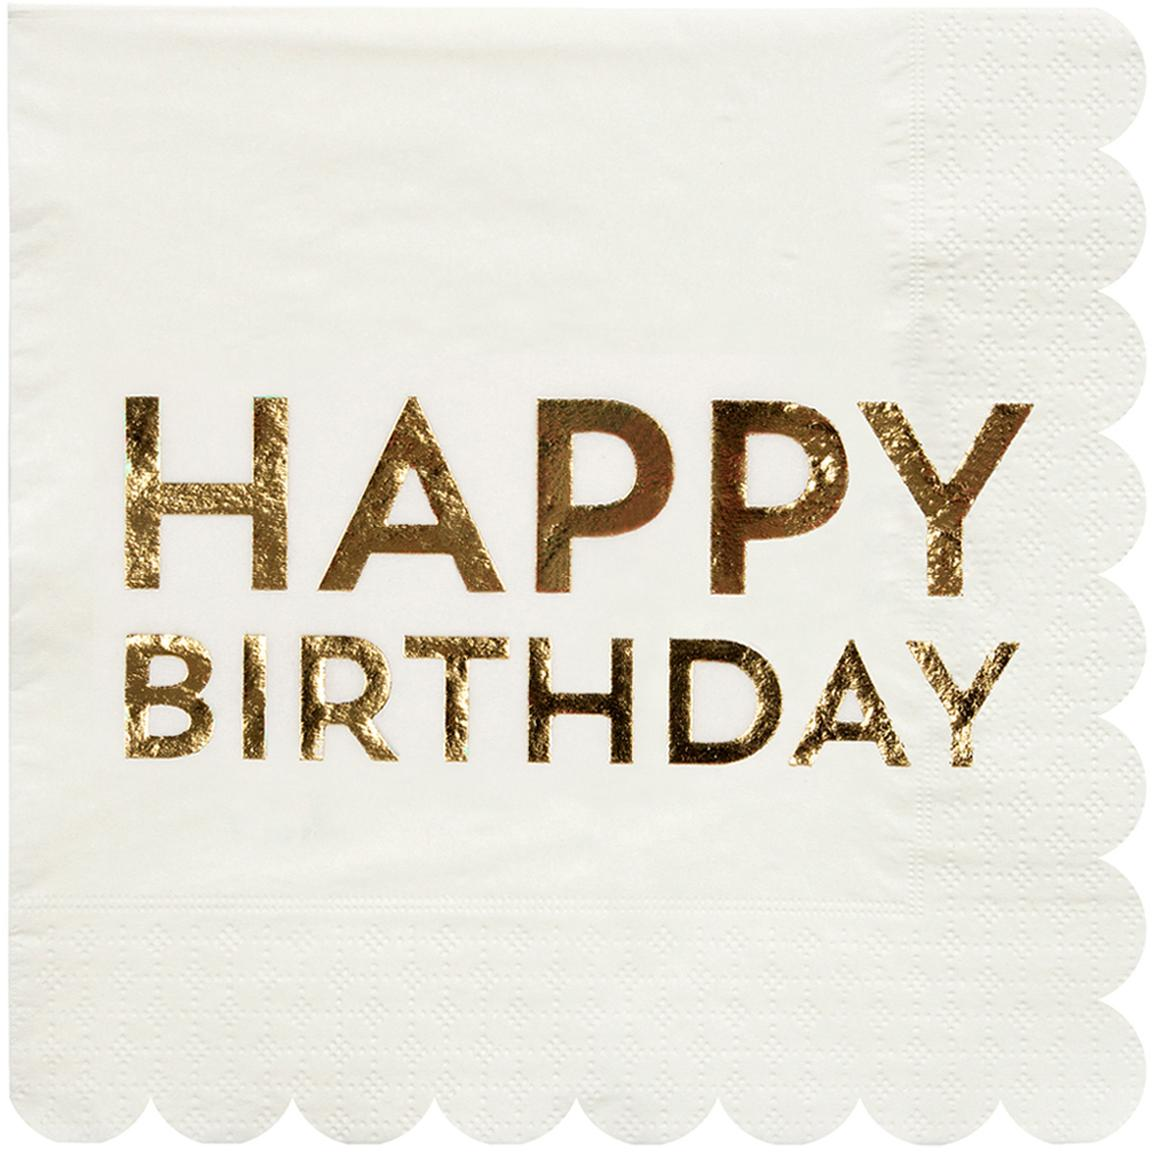 Papieren servetten Birthday, 16 stuks, Papier, Wit, goudkleurig, 33 x 33 cm